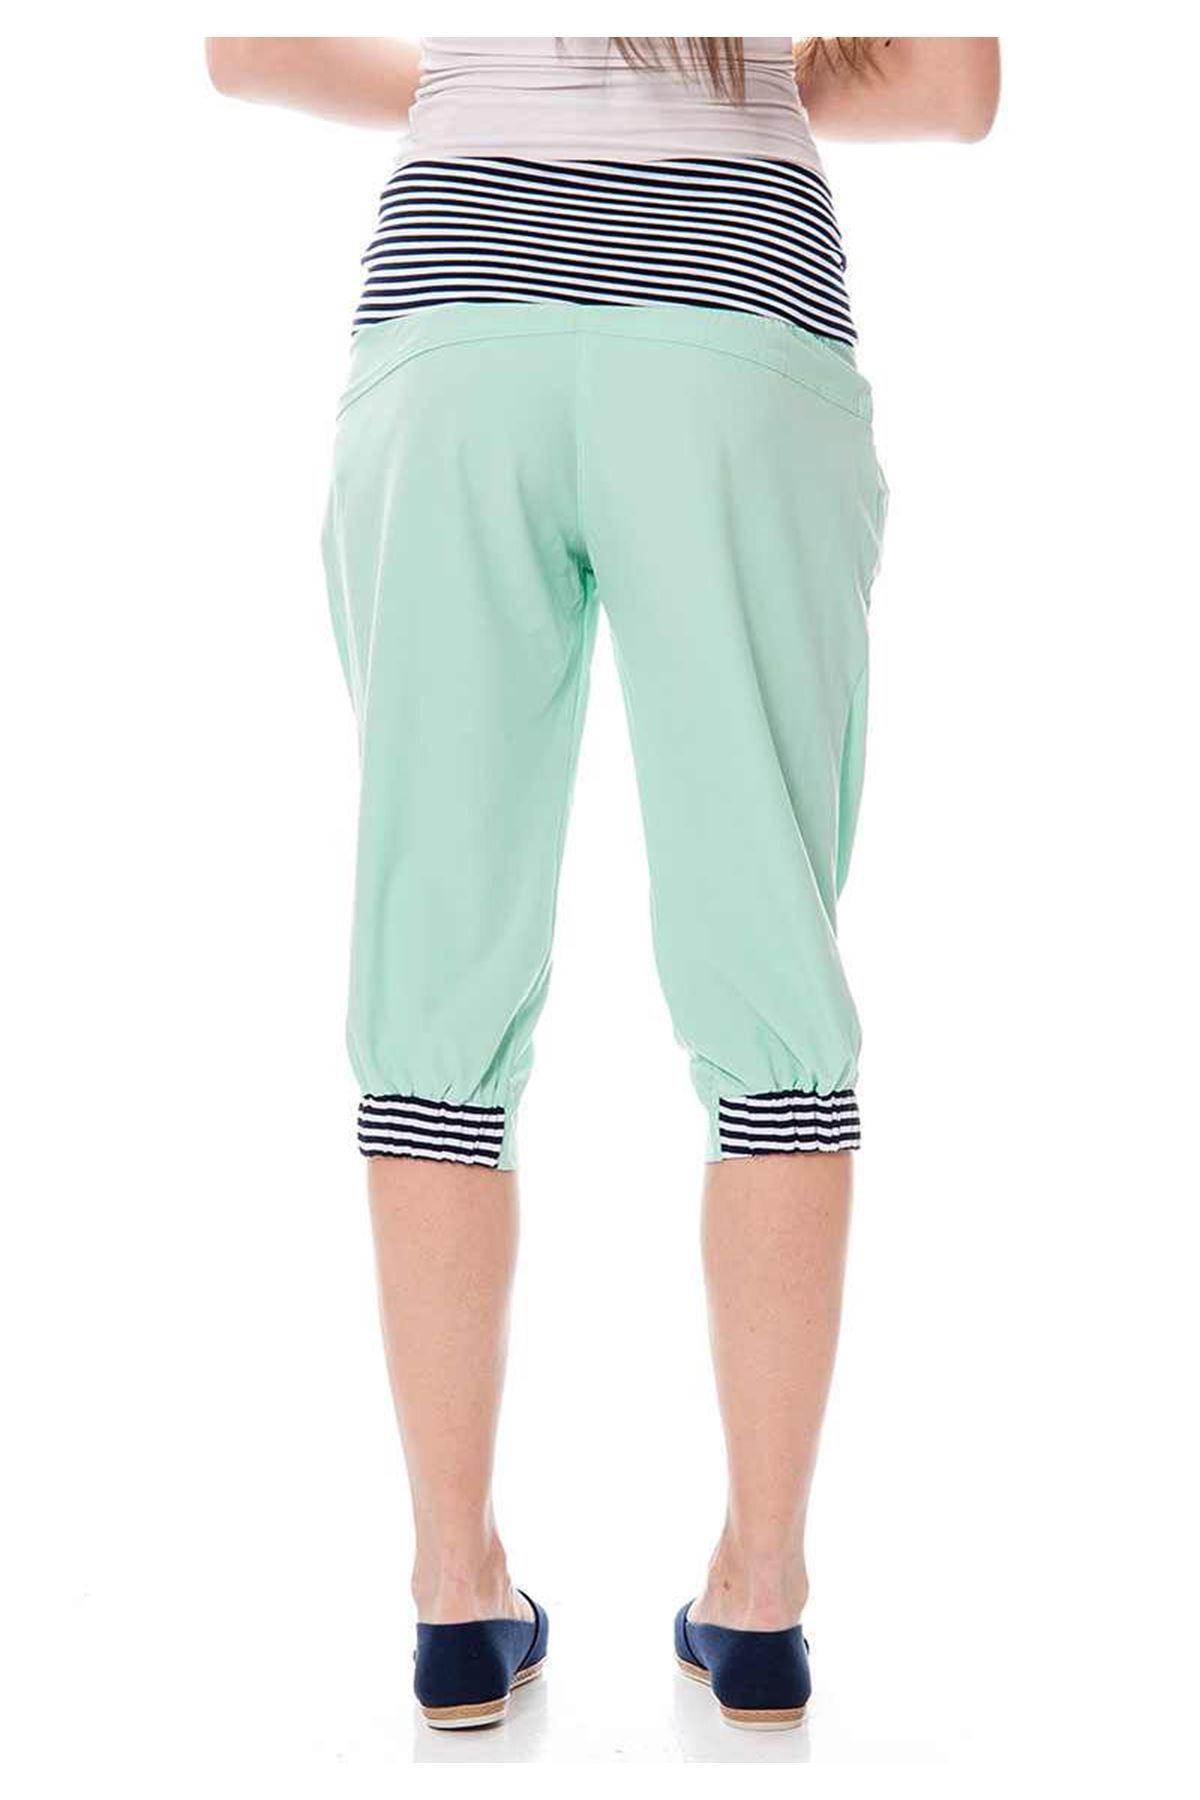 Mint Yeşili Kapri Kadın Pantolon H4-115834